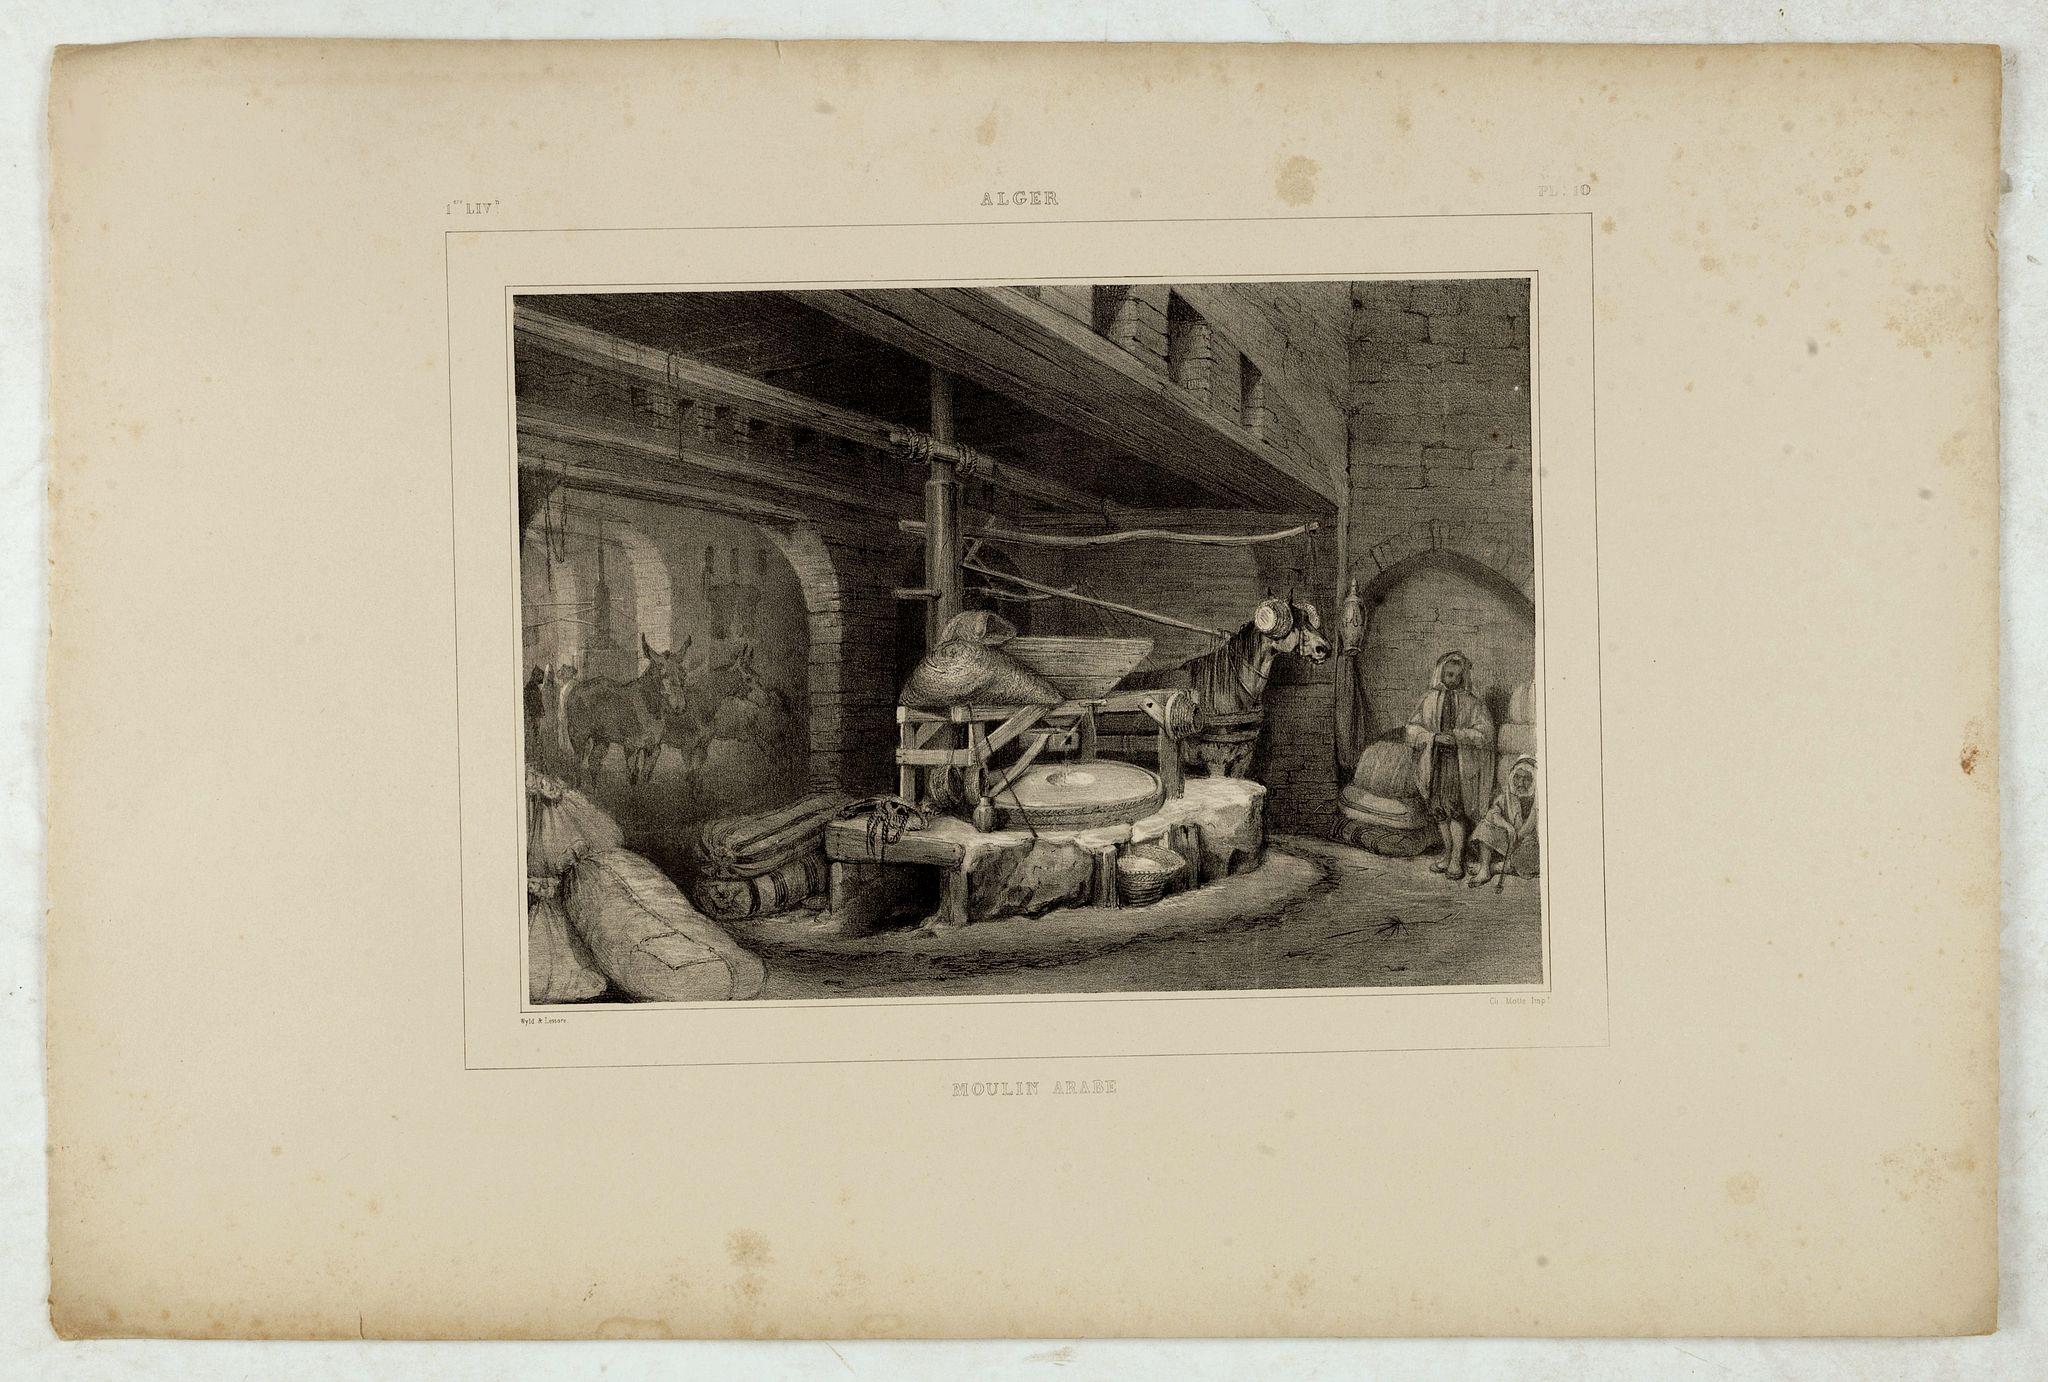 WYLD William / LESSORE Emile -  Alger, moulin arabe.